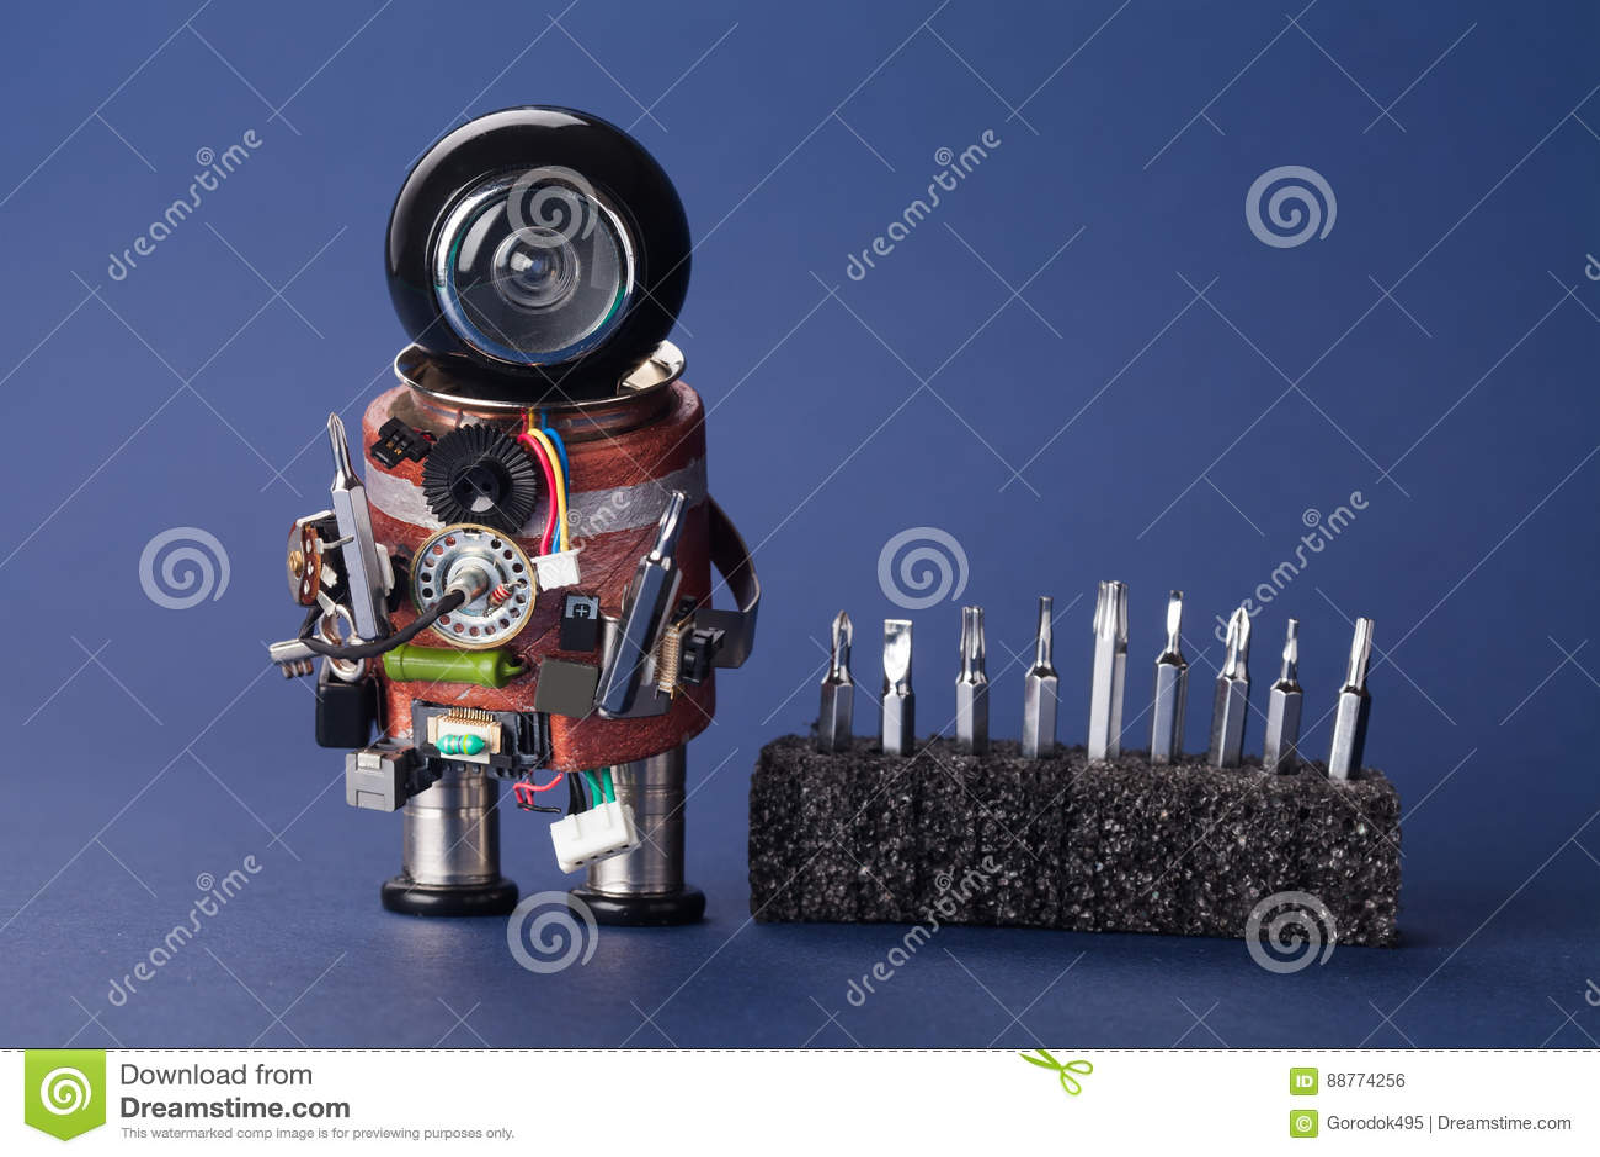 Electrician robot with screwdriver set. Fun service character, black helmet head and handyman instrument. Macro view